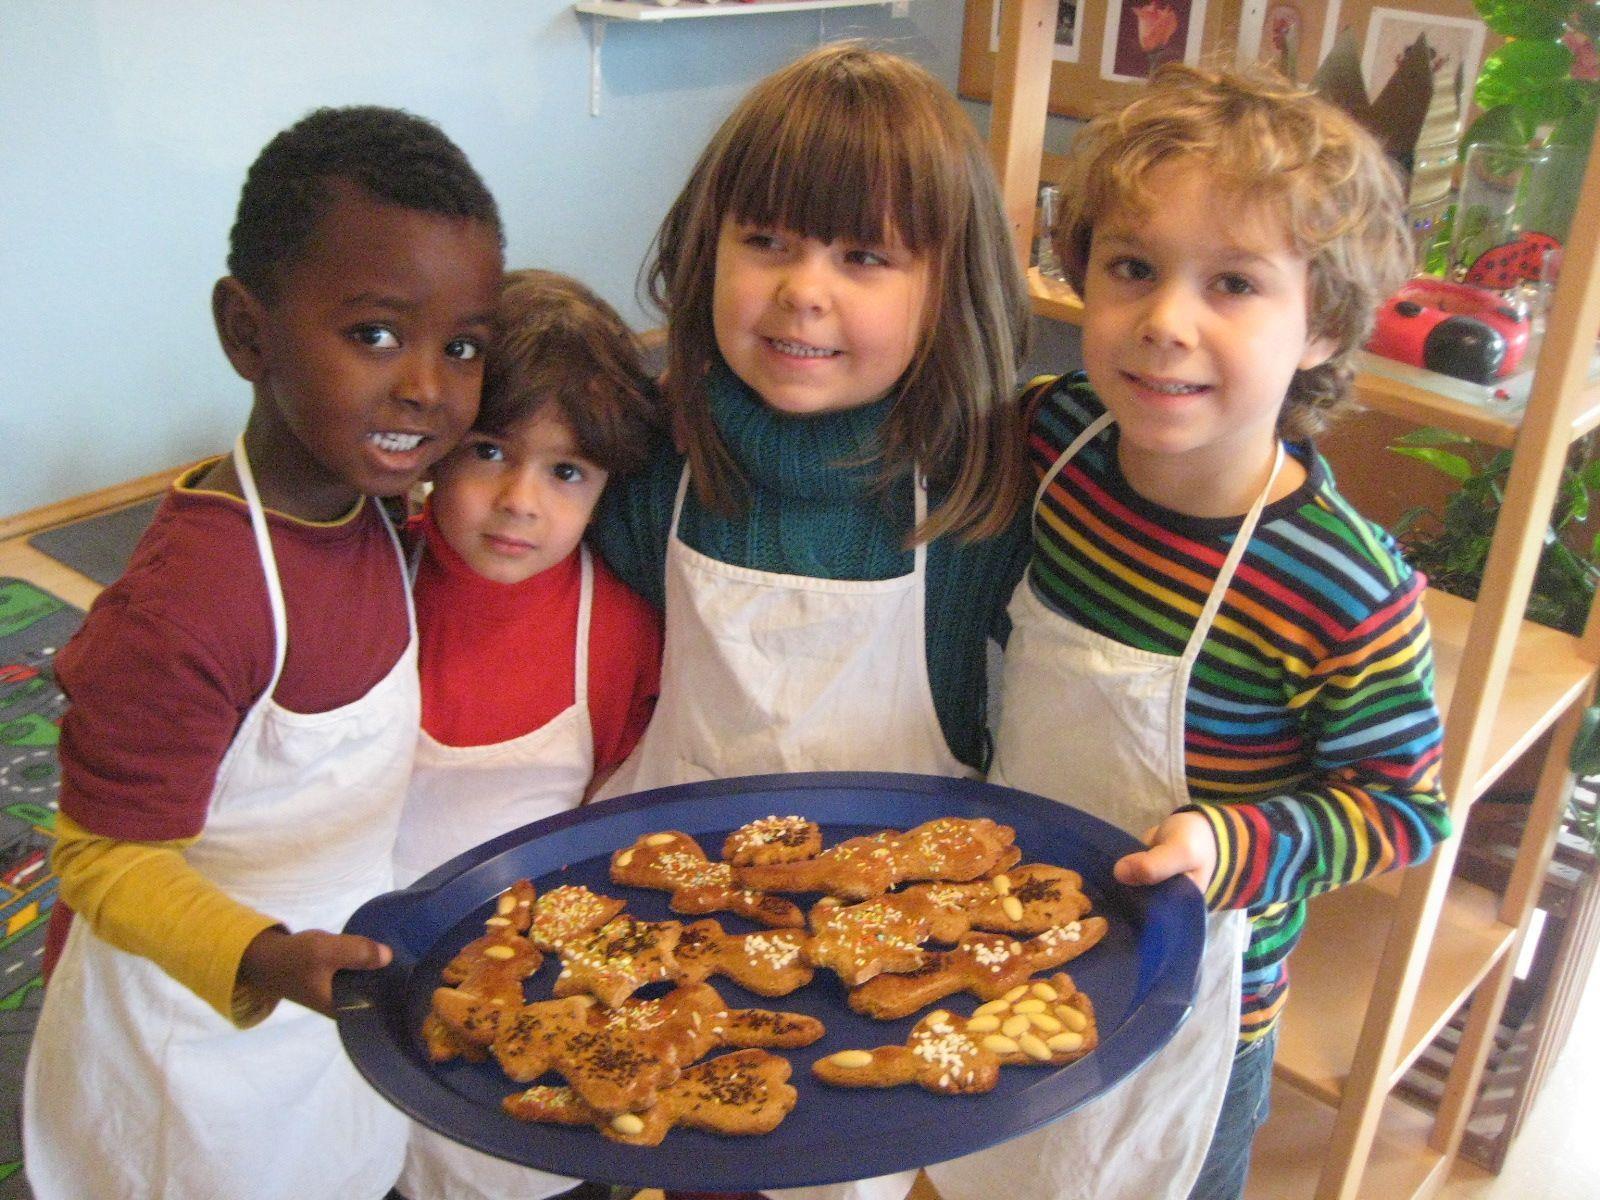 Im Bewegungskindergarten Merowinger werden fleissig Kekse gebacken.